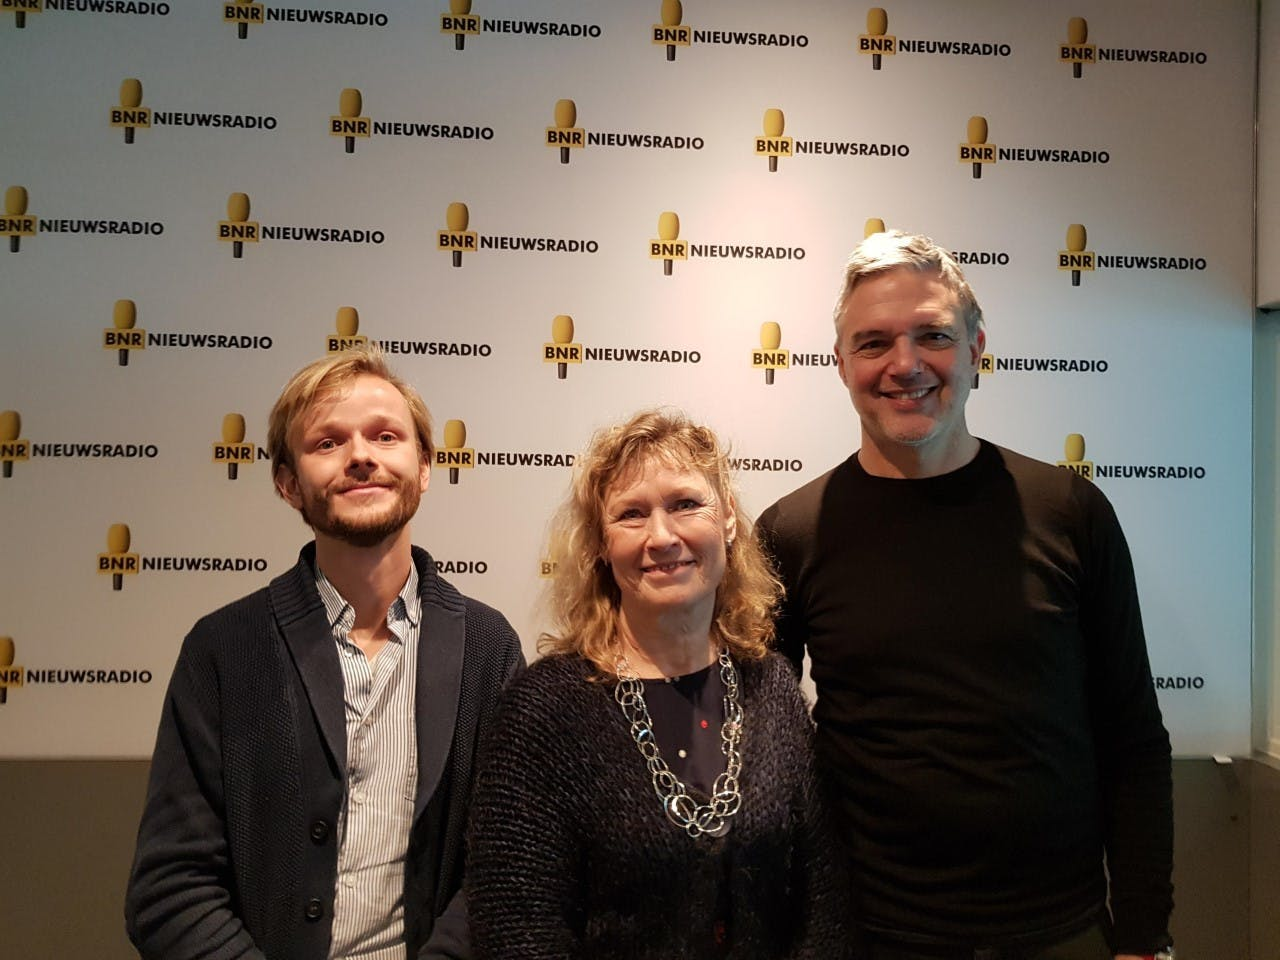 V.l.n.r.: Merlijn Blok, Elphi Nelissen en Paul Laseur